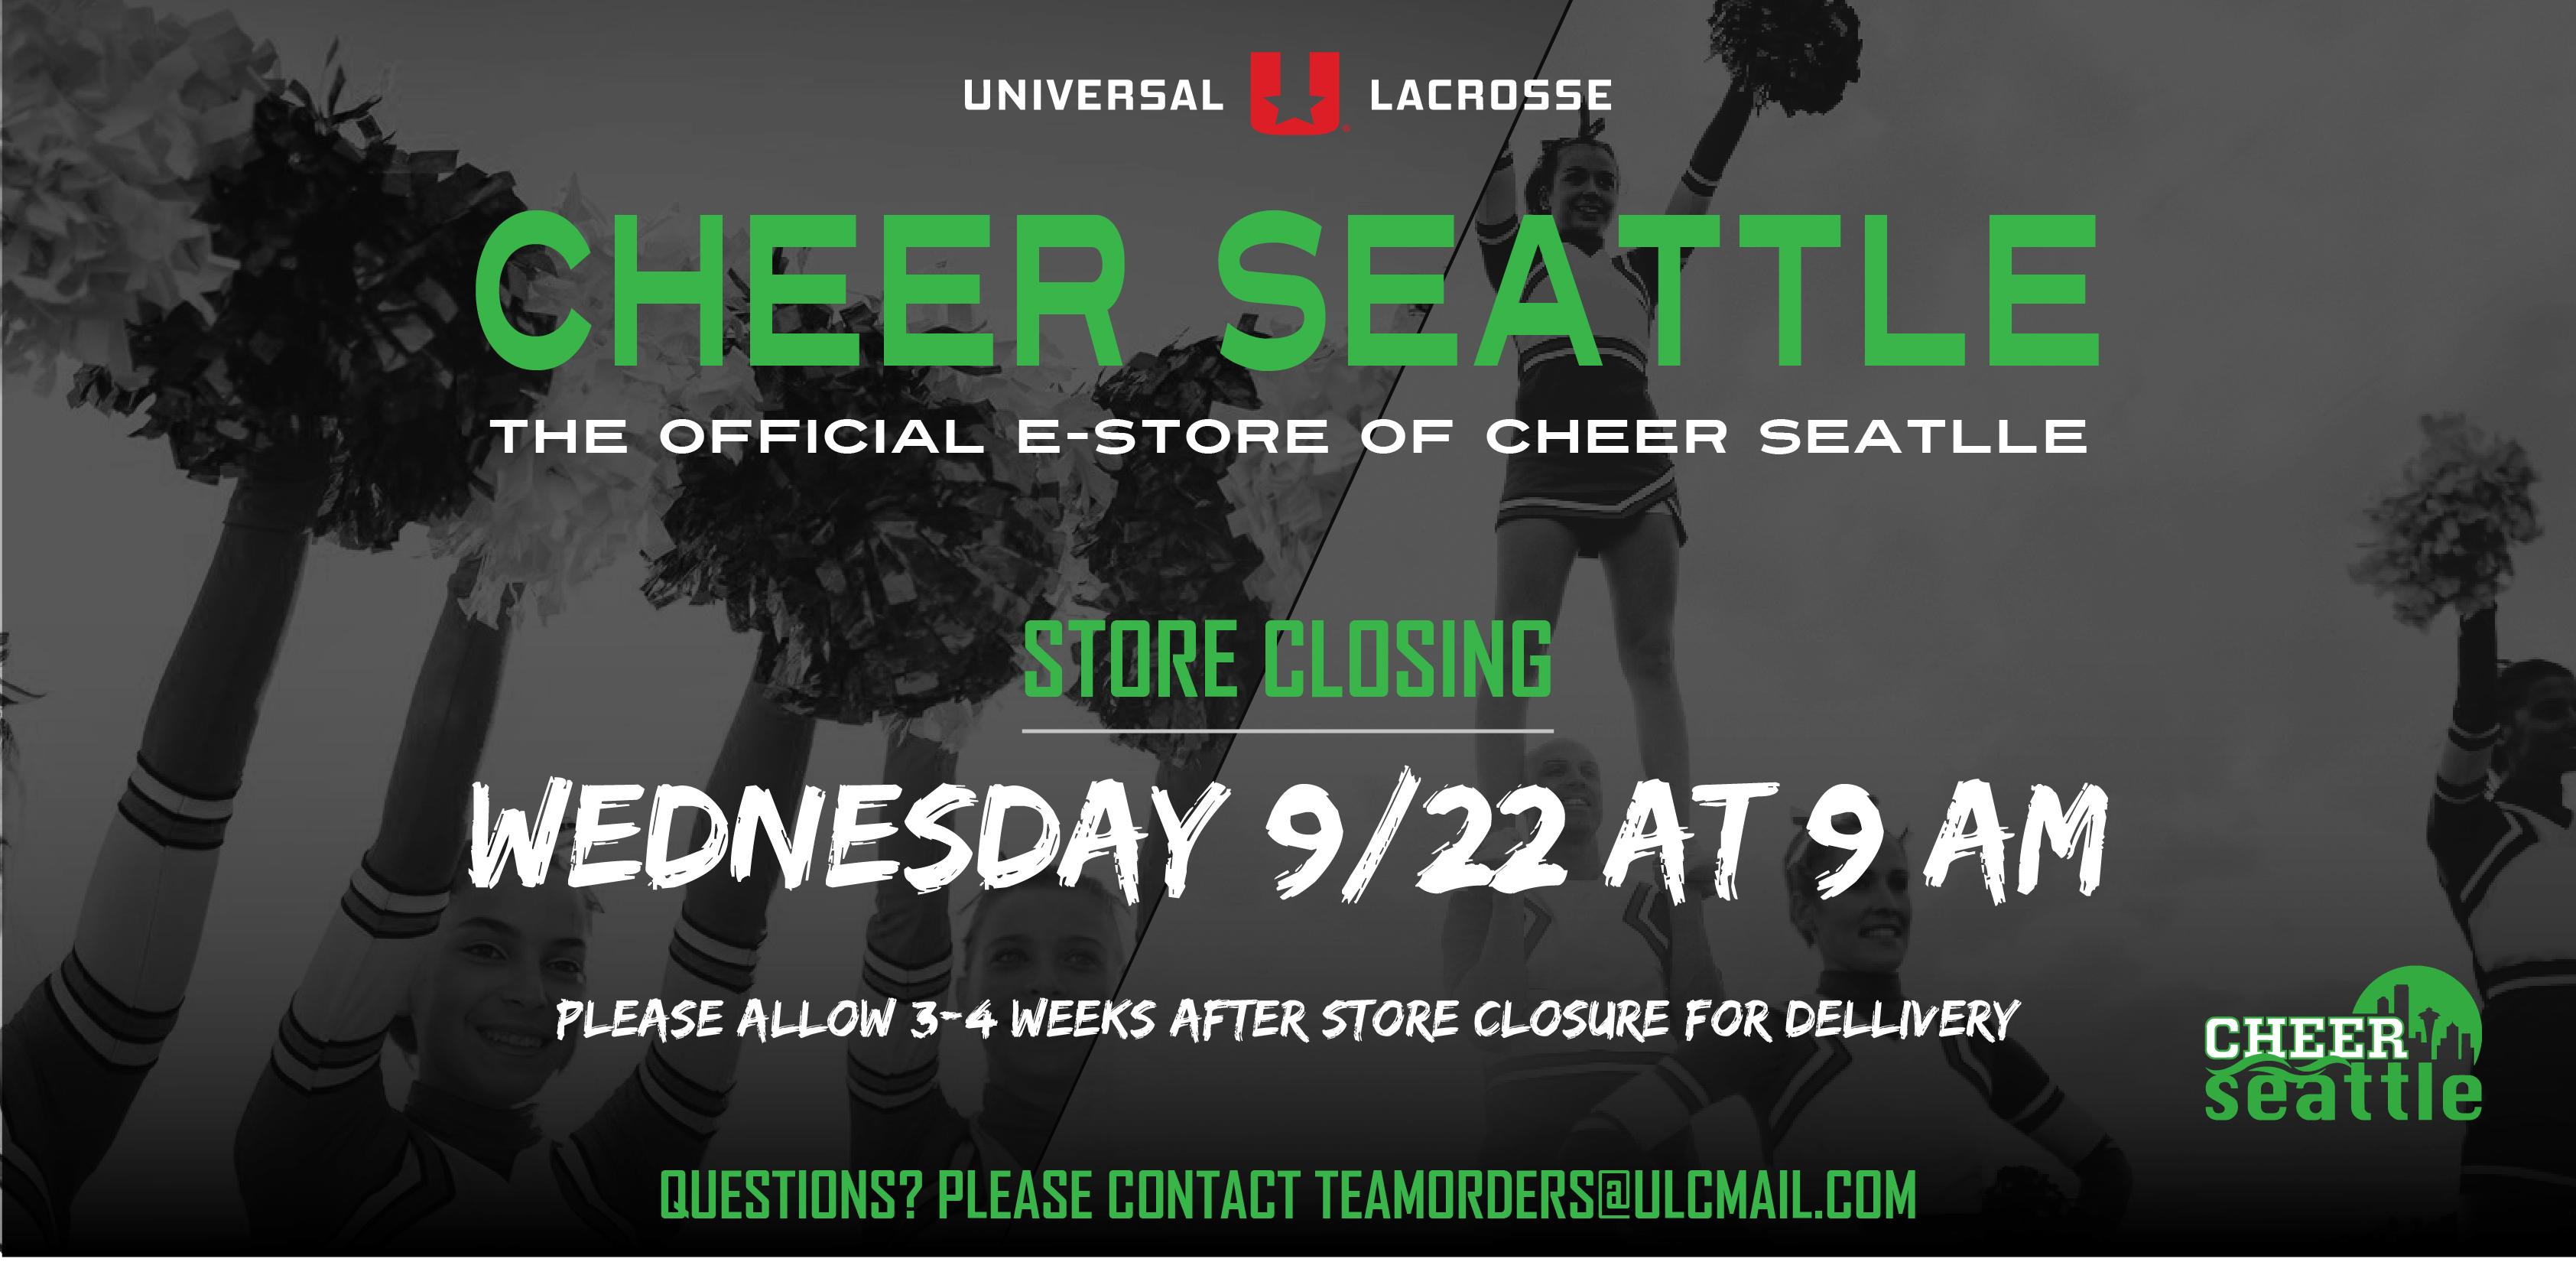 Cheer Seattle